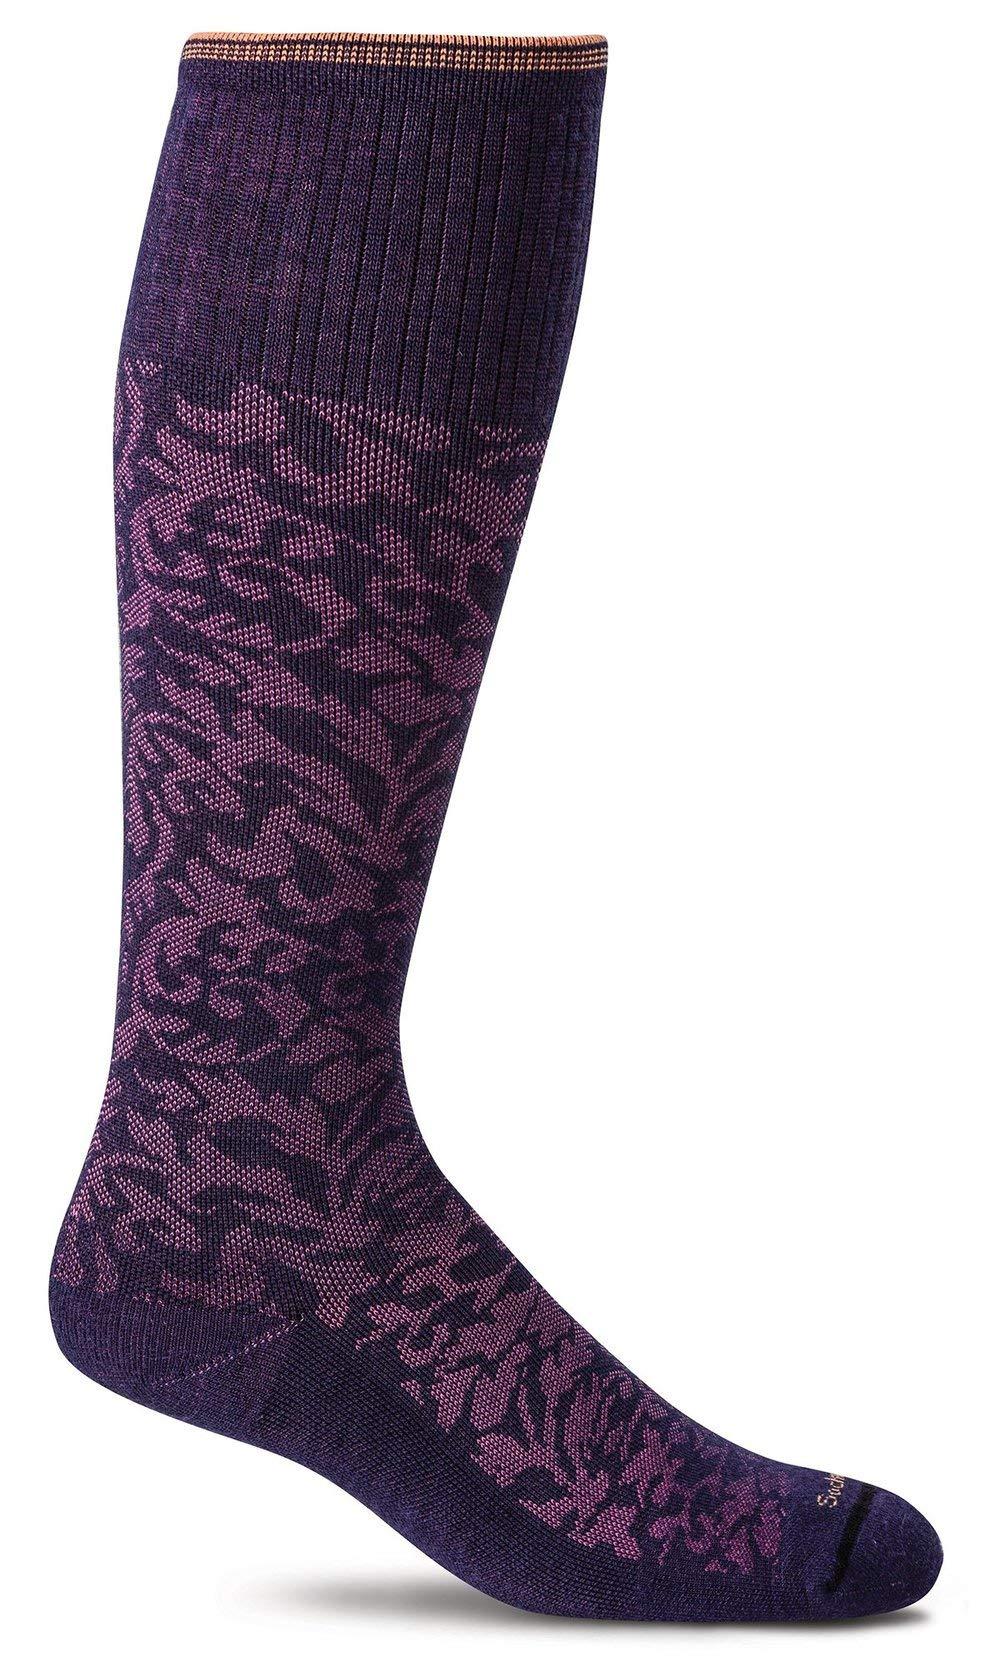 Sockwell Women's Damask Socks, Concorde, Small/Medium